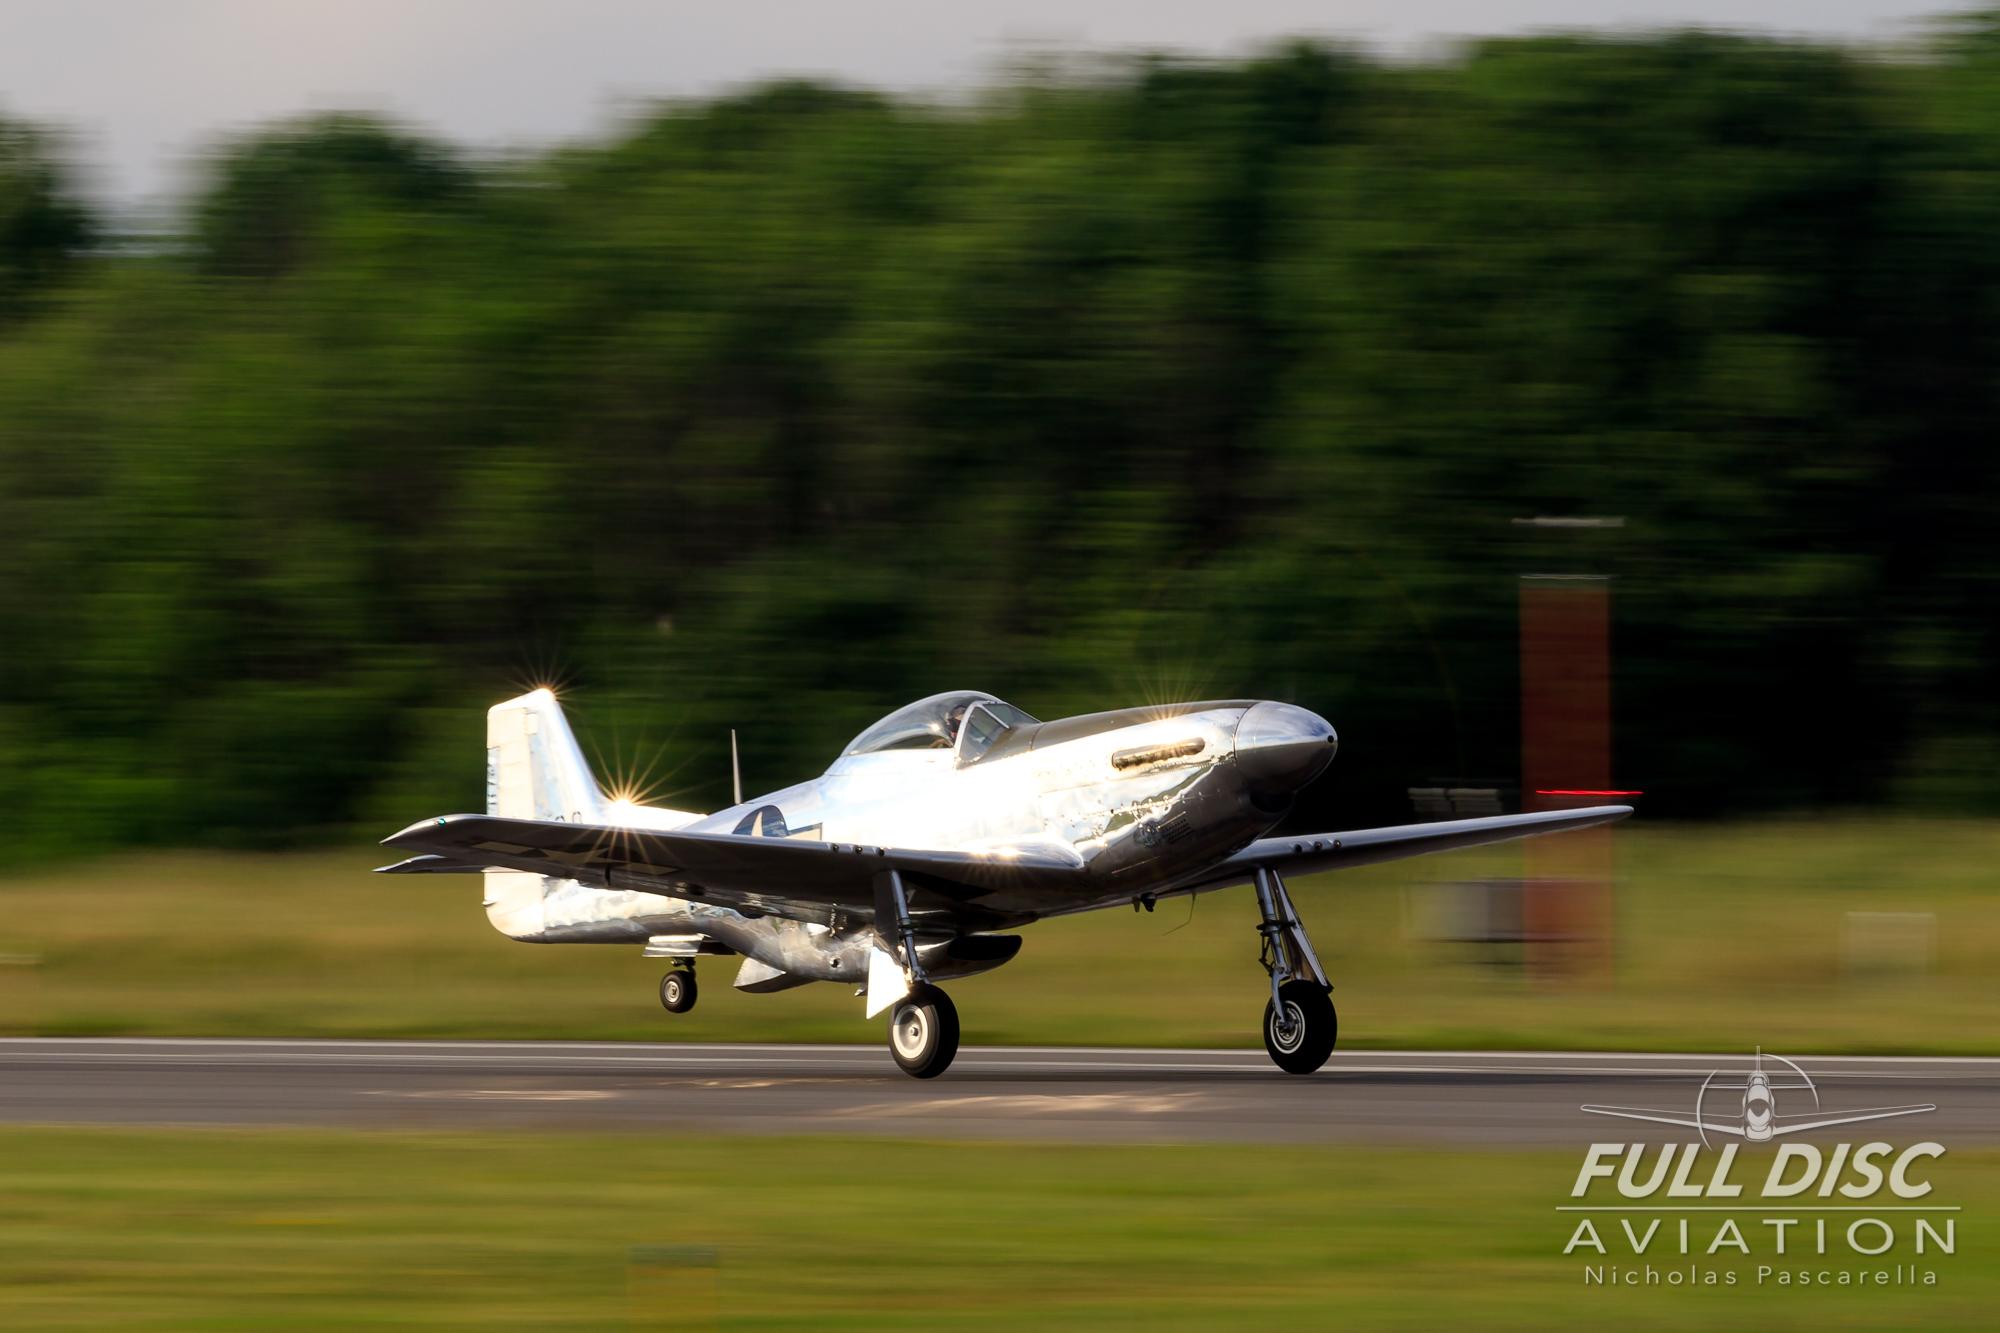 andrewmckenna_fulldiscaviation_nickpascarella_mustang_p51_takeoff_green.jpg